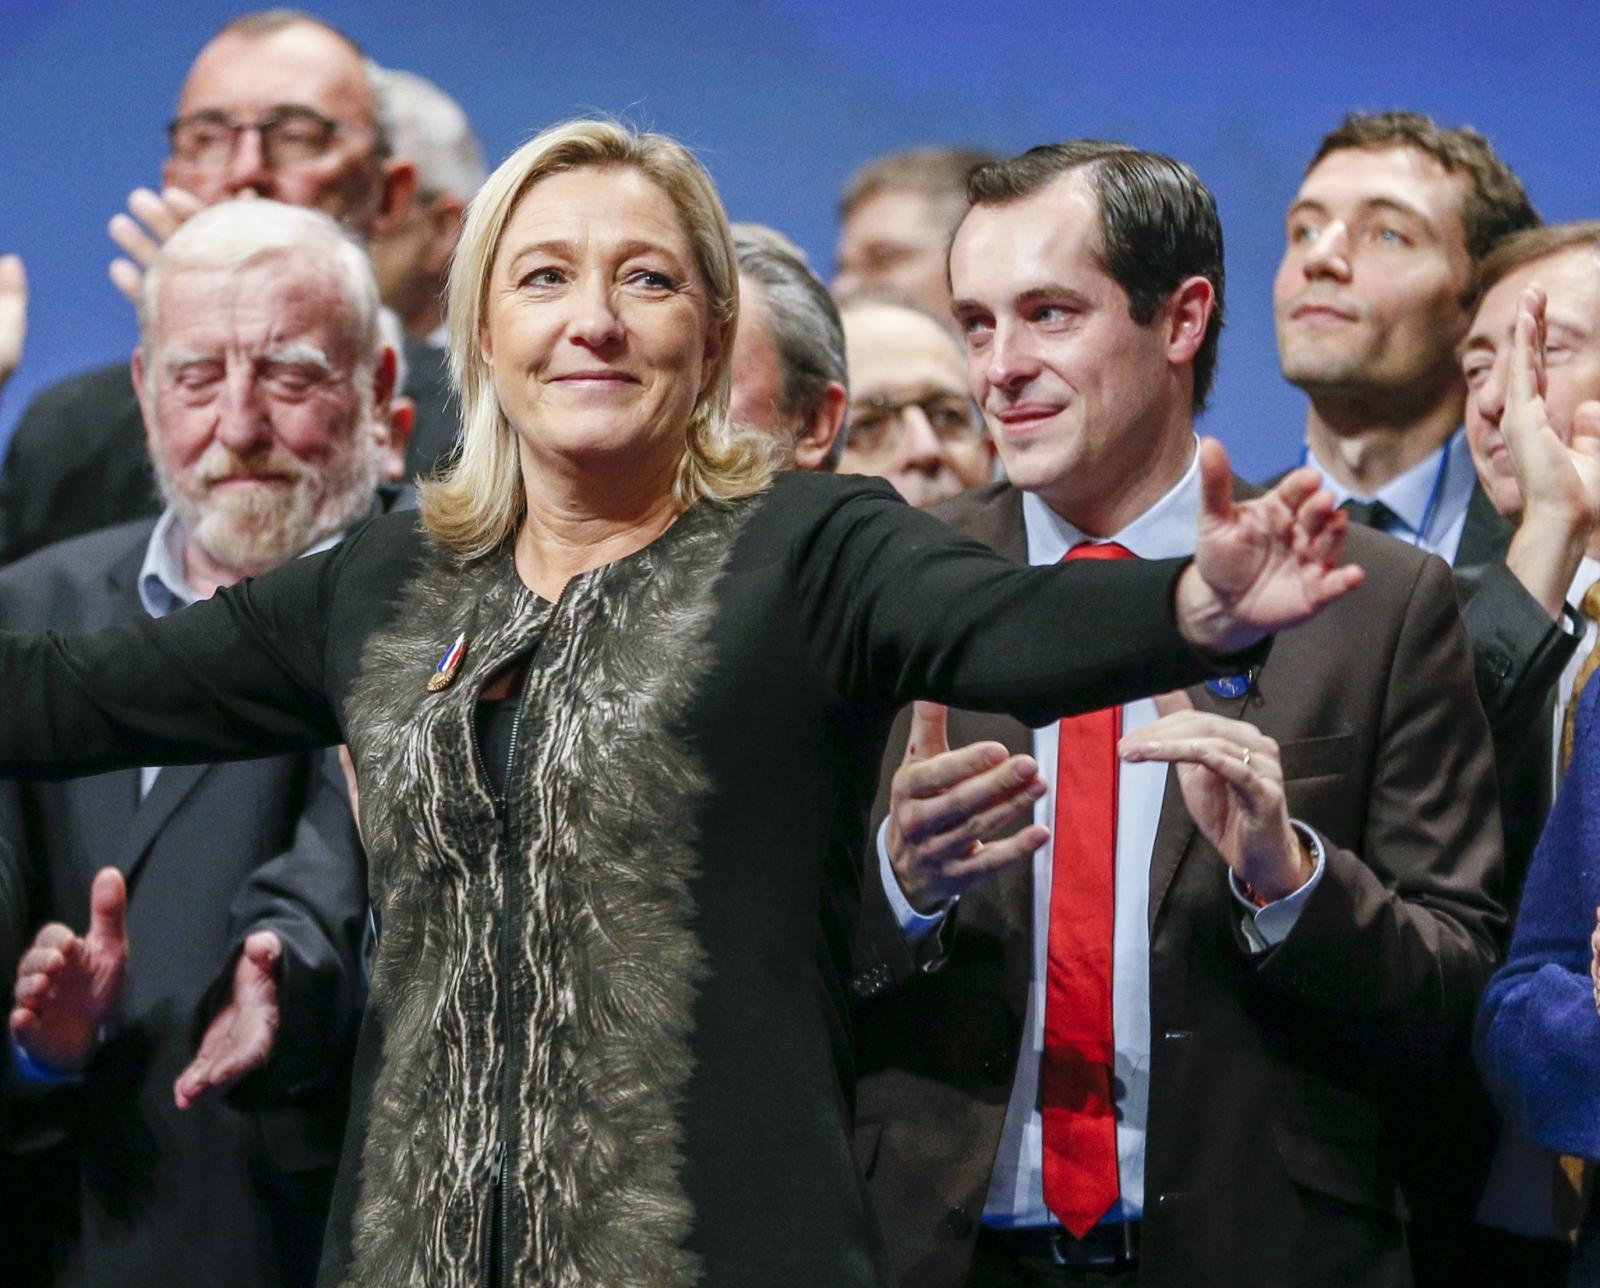 Marine Le Pen FN